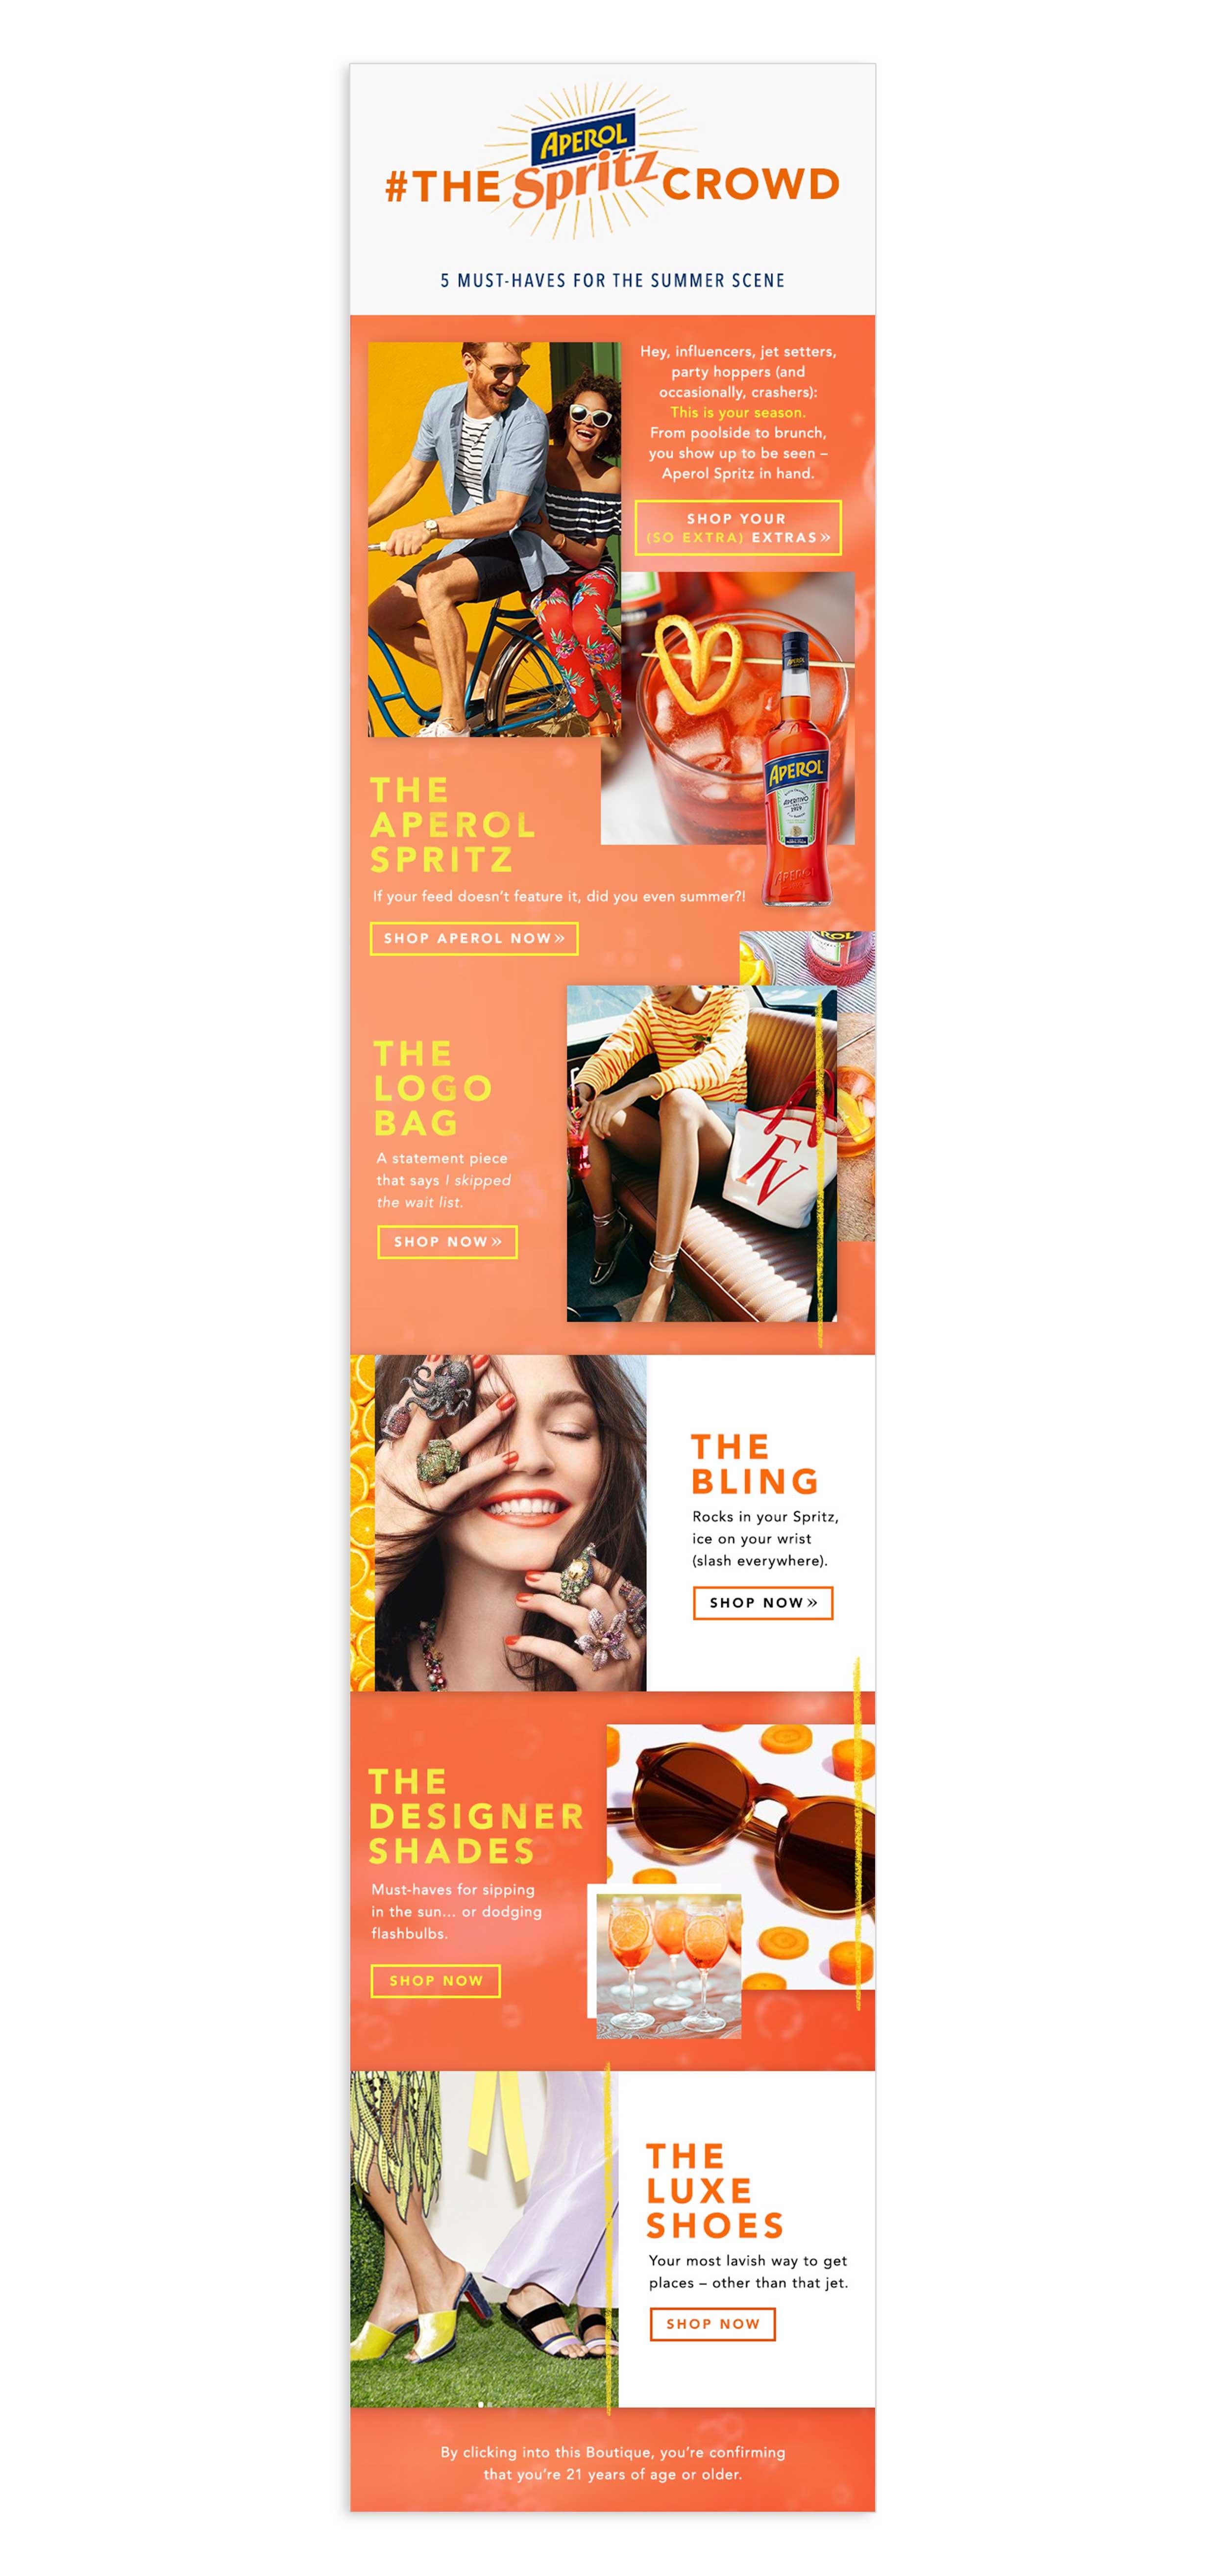 email-lvg-lvgdesigns-lvgworks-graphic-design-designer-type-typeography-font-drink-alcohol-fashion-photography-concept-collage.jpg